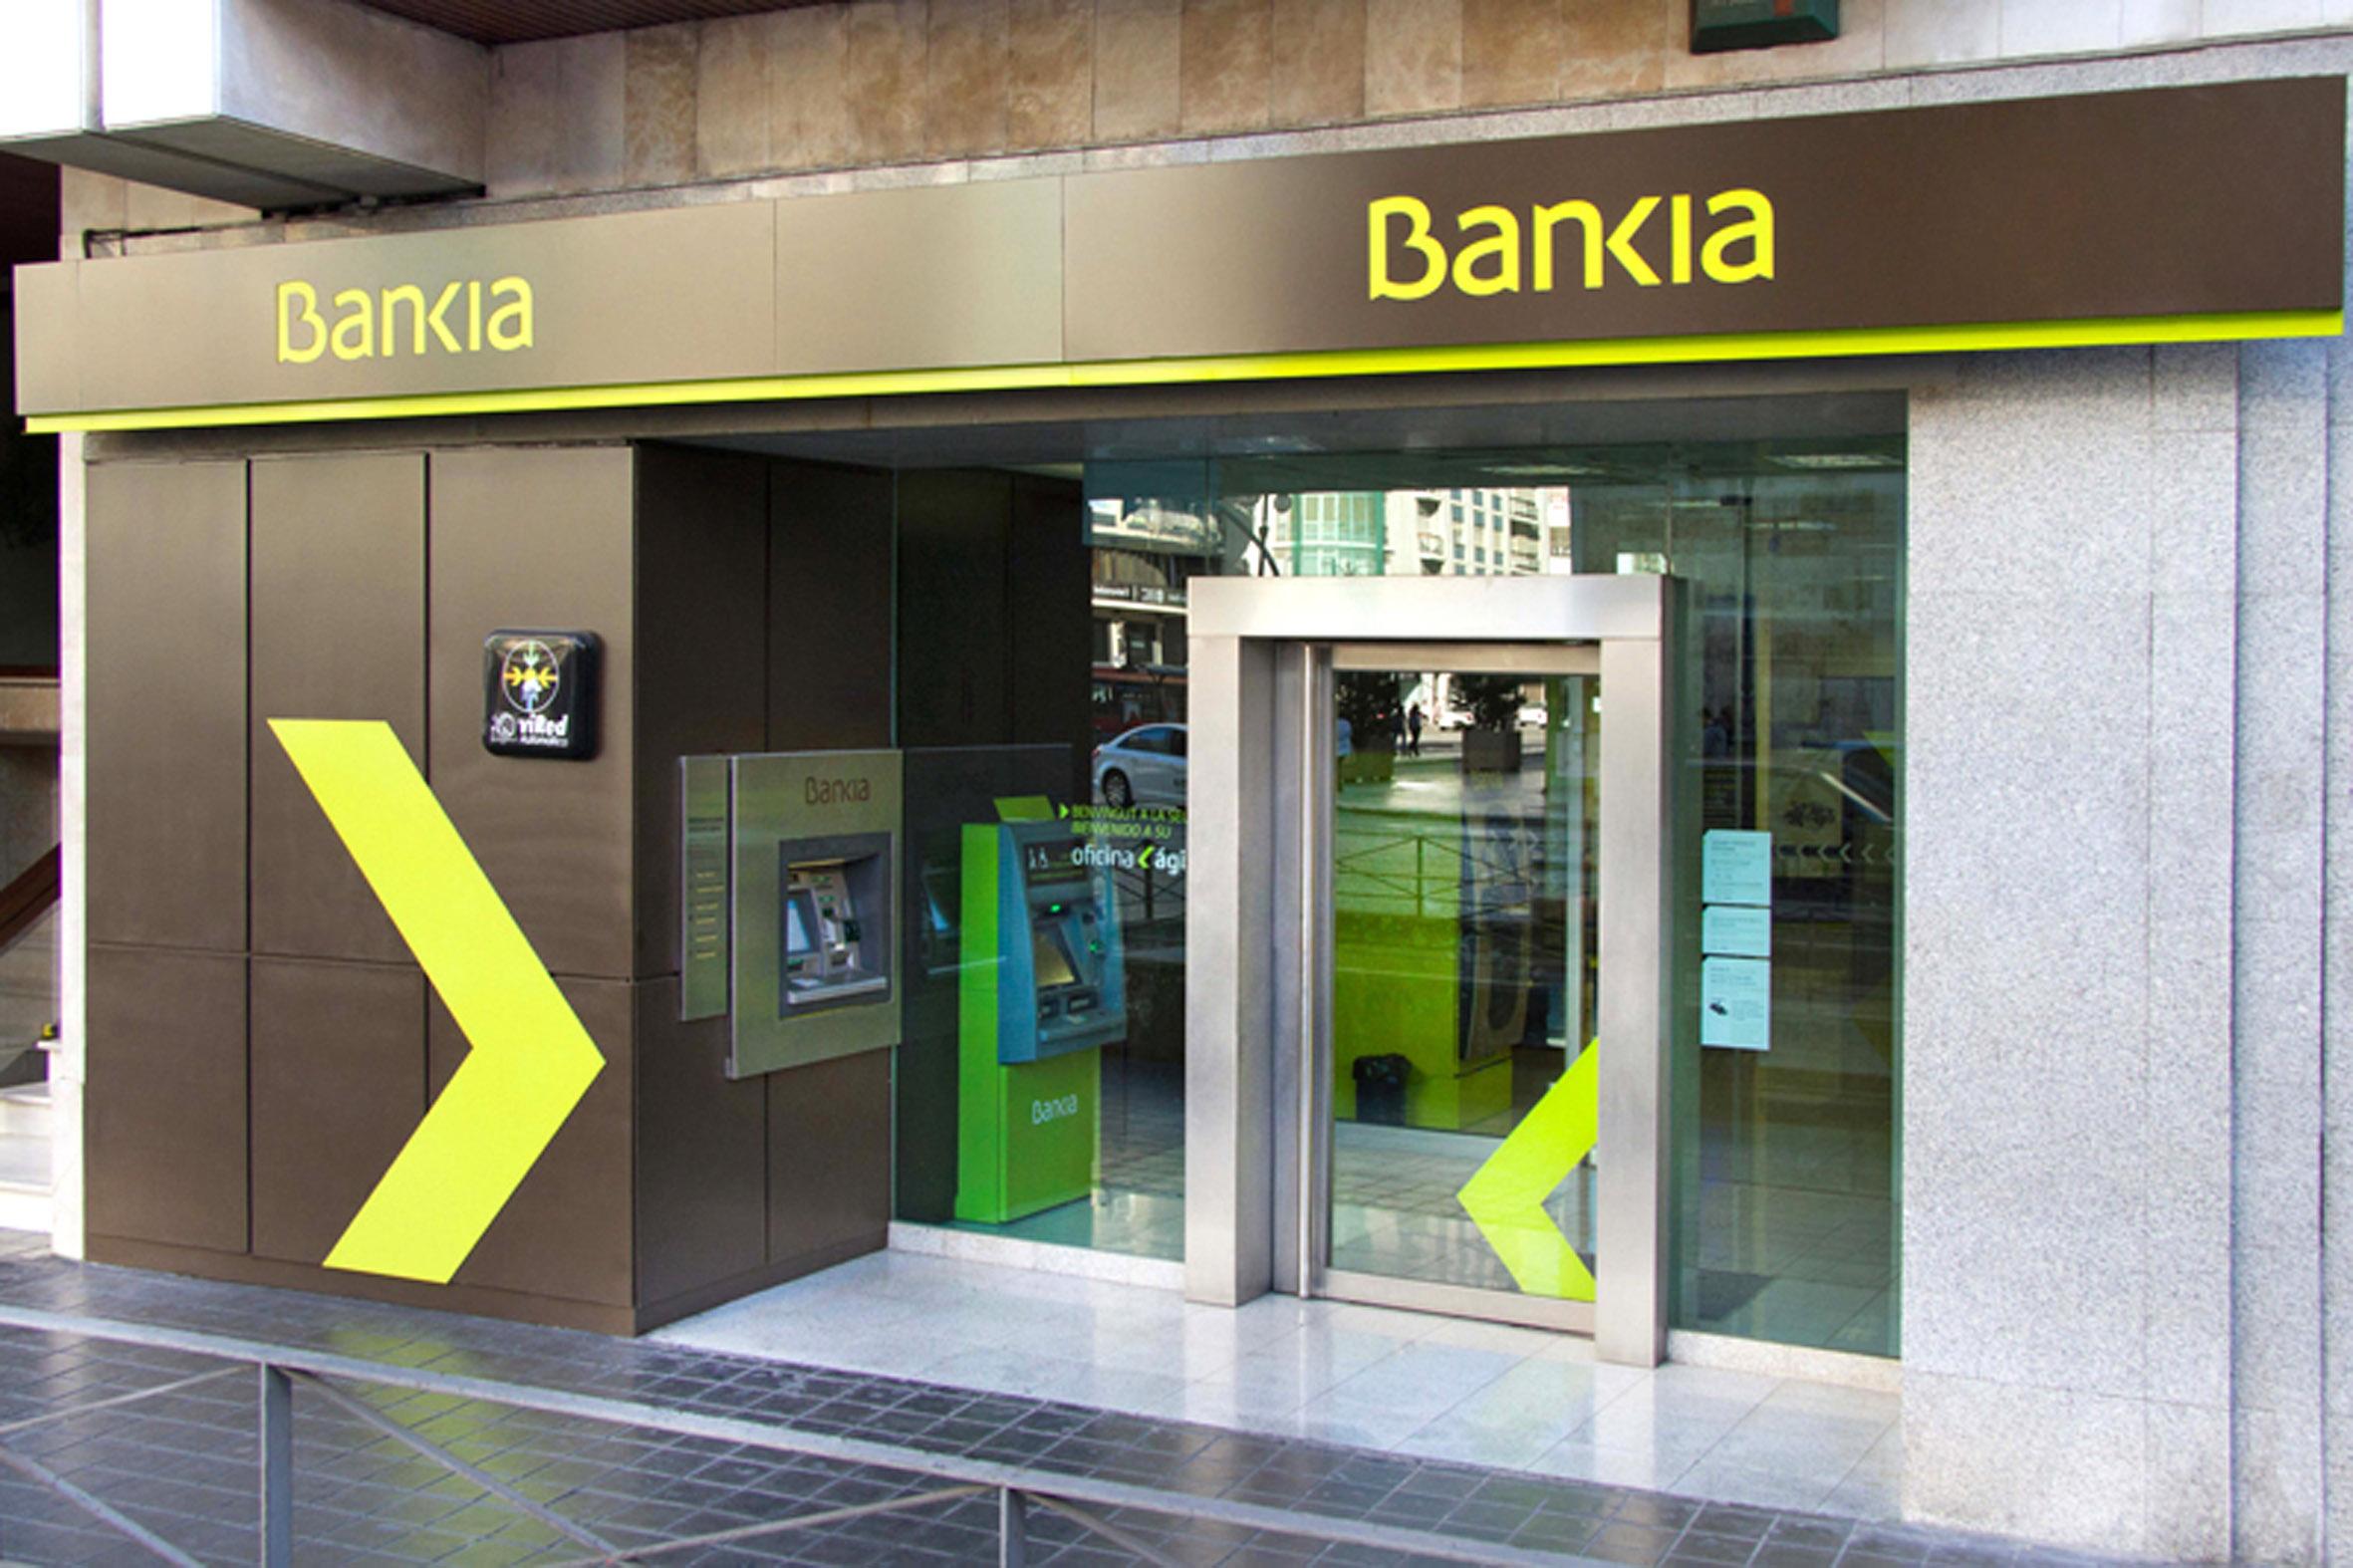 bankia capt un 5 m s de clientes con n mina el a o